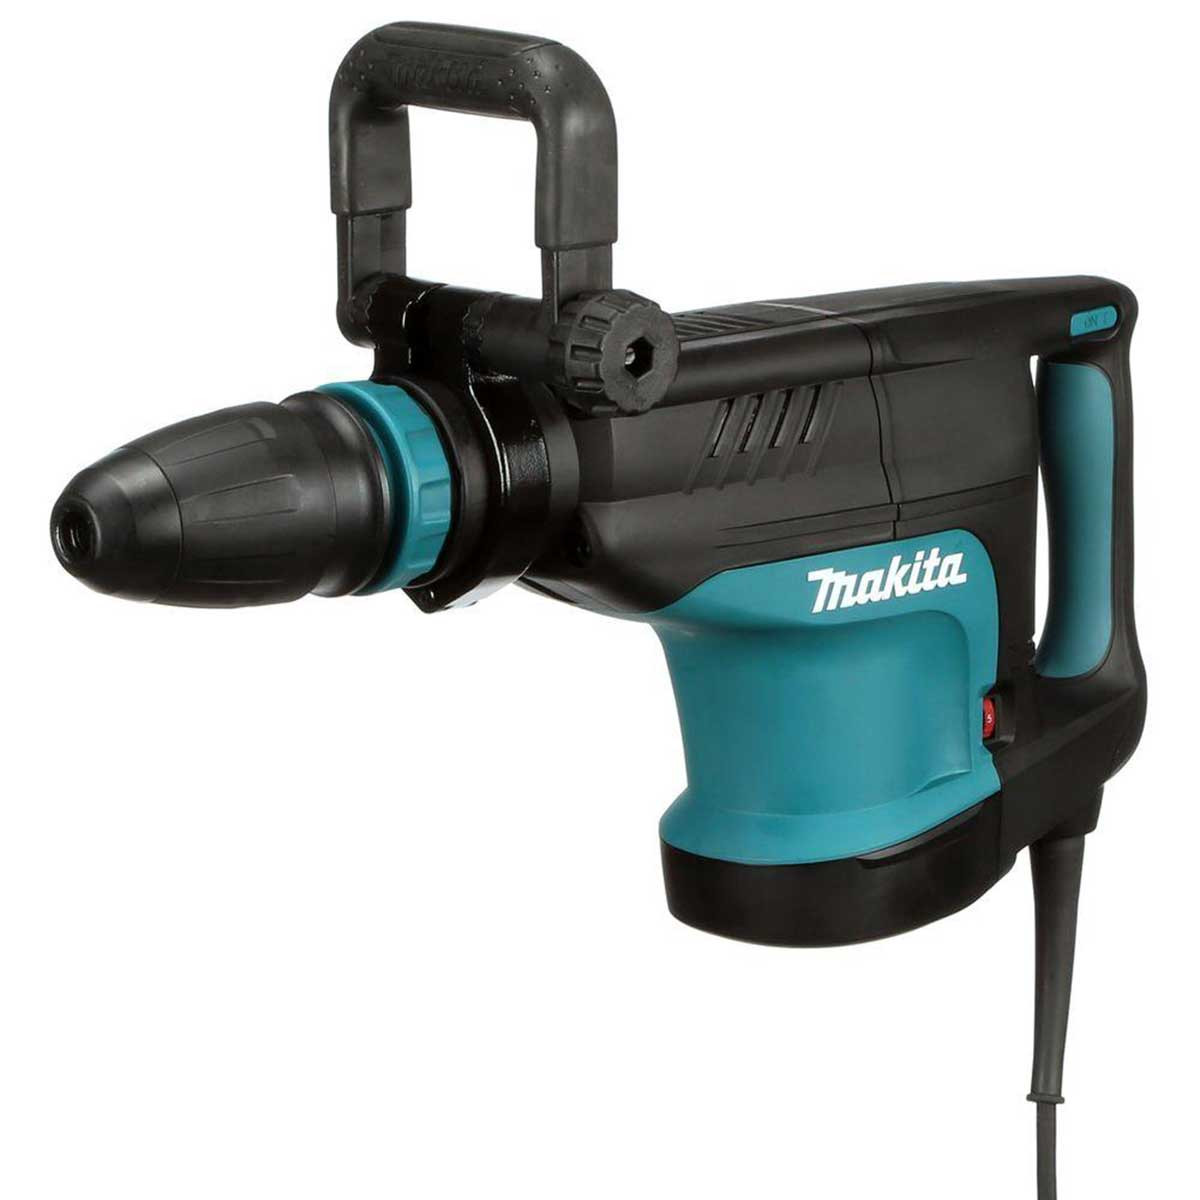 HM1203C Makita 20 lbs Demo Hammer